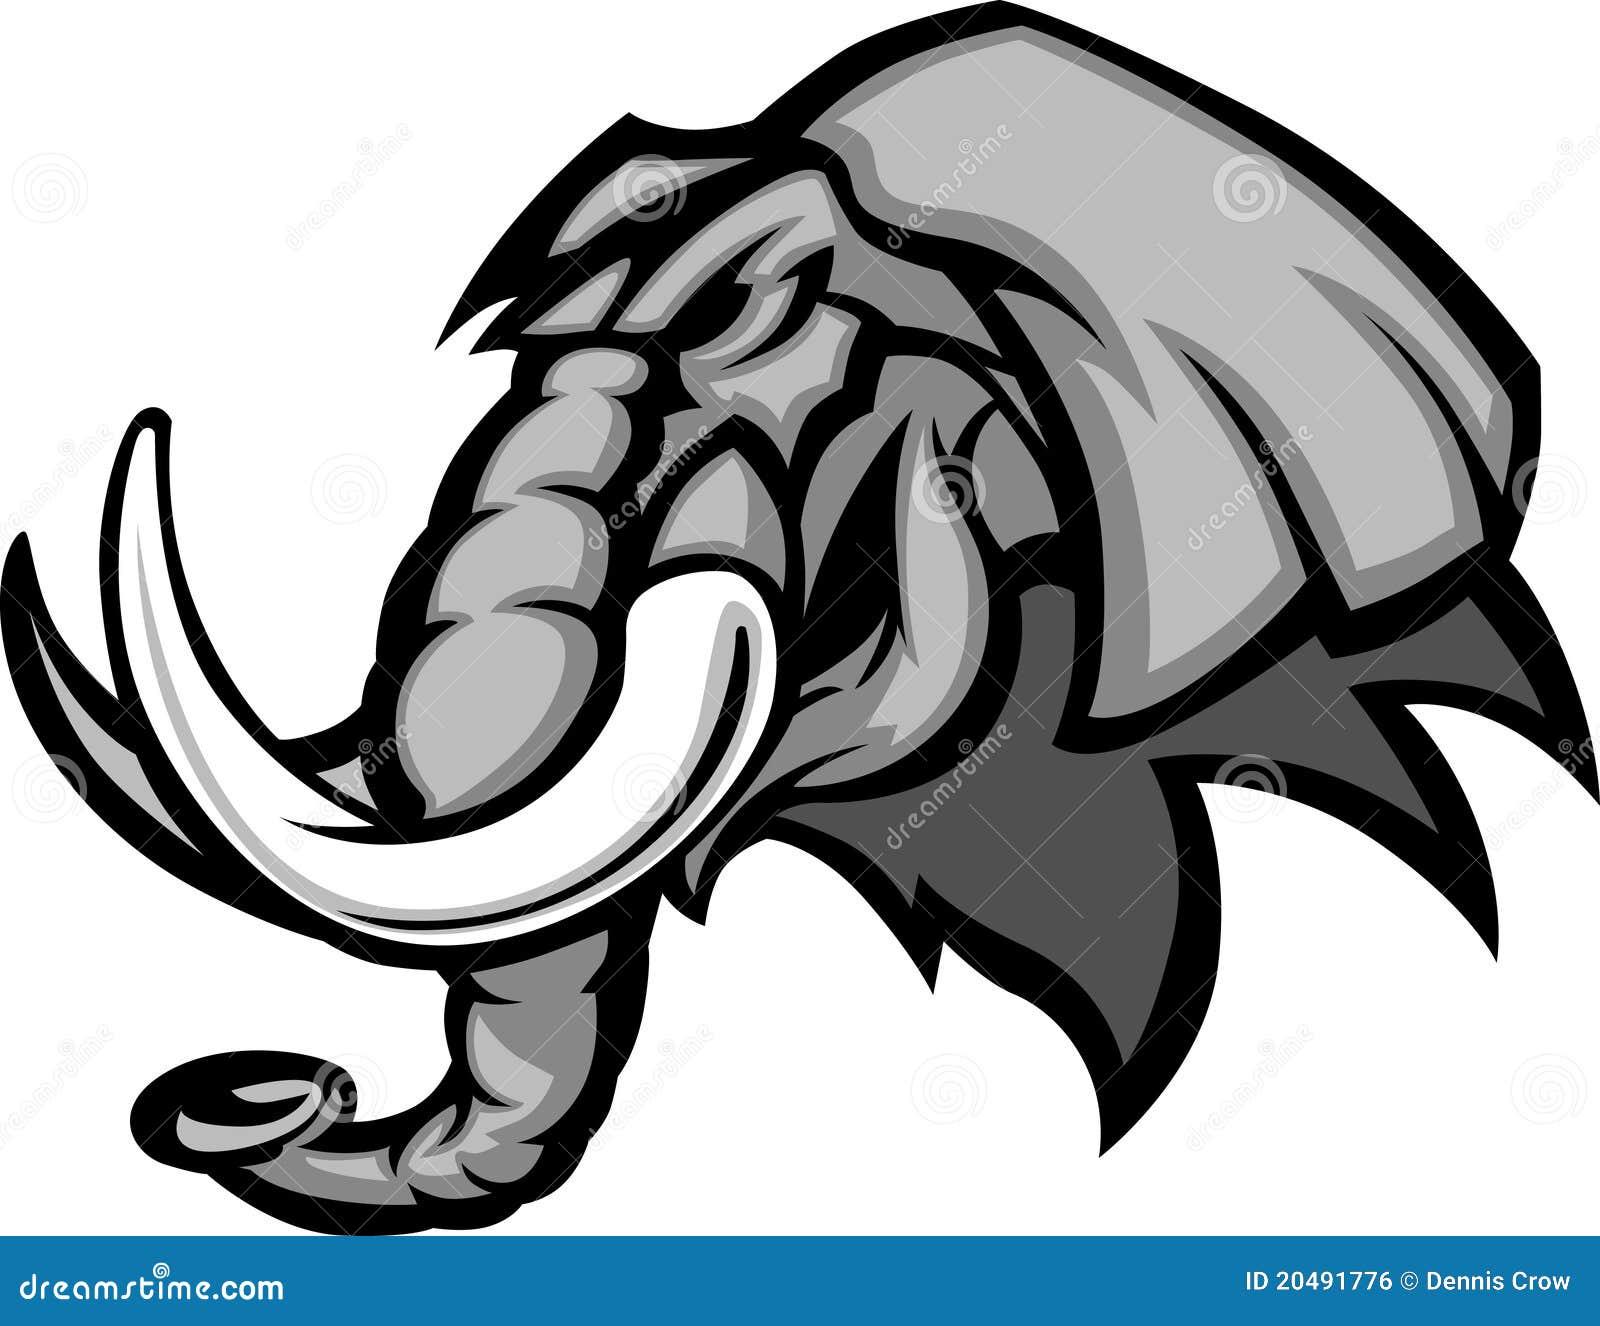 Elephant Mascot Head Vector Graphic Stock Vector Illustration Of Graphic Mascot 20491776 1,000+ vectors, stock photos & psd files. dreamstime com